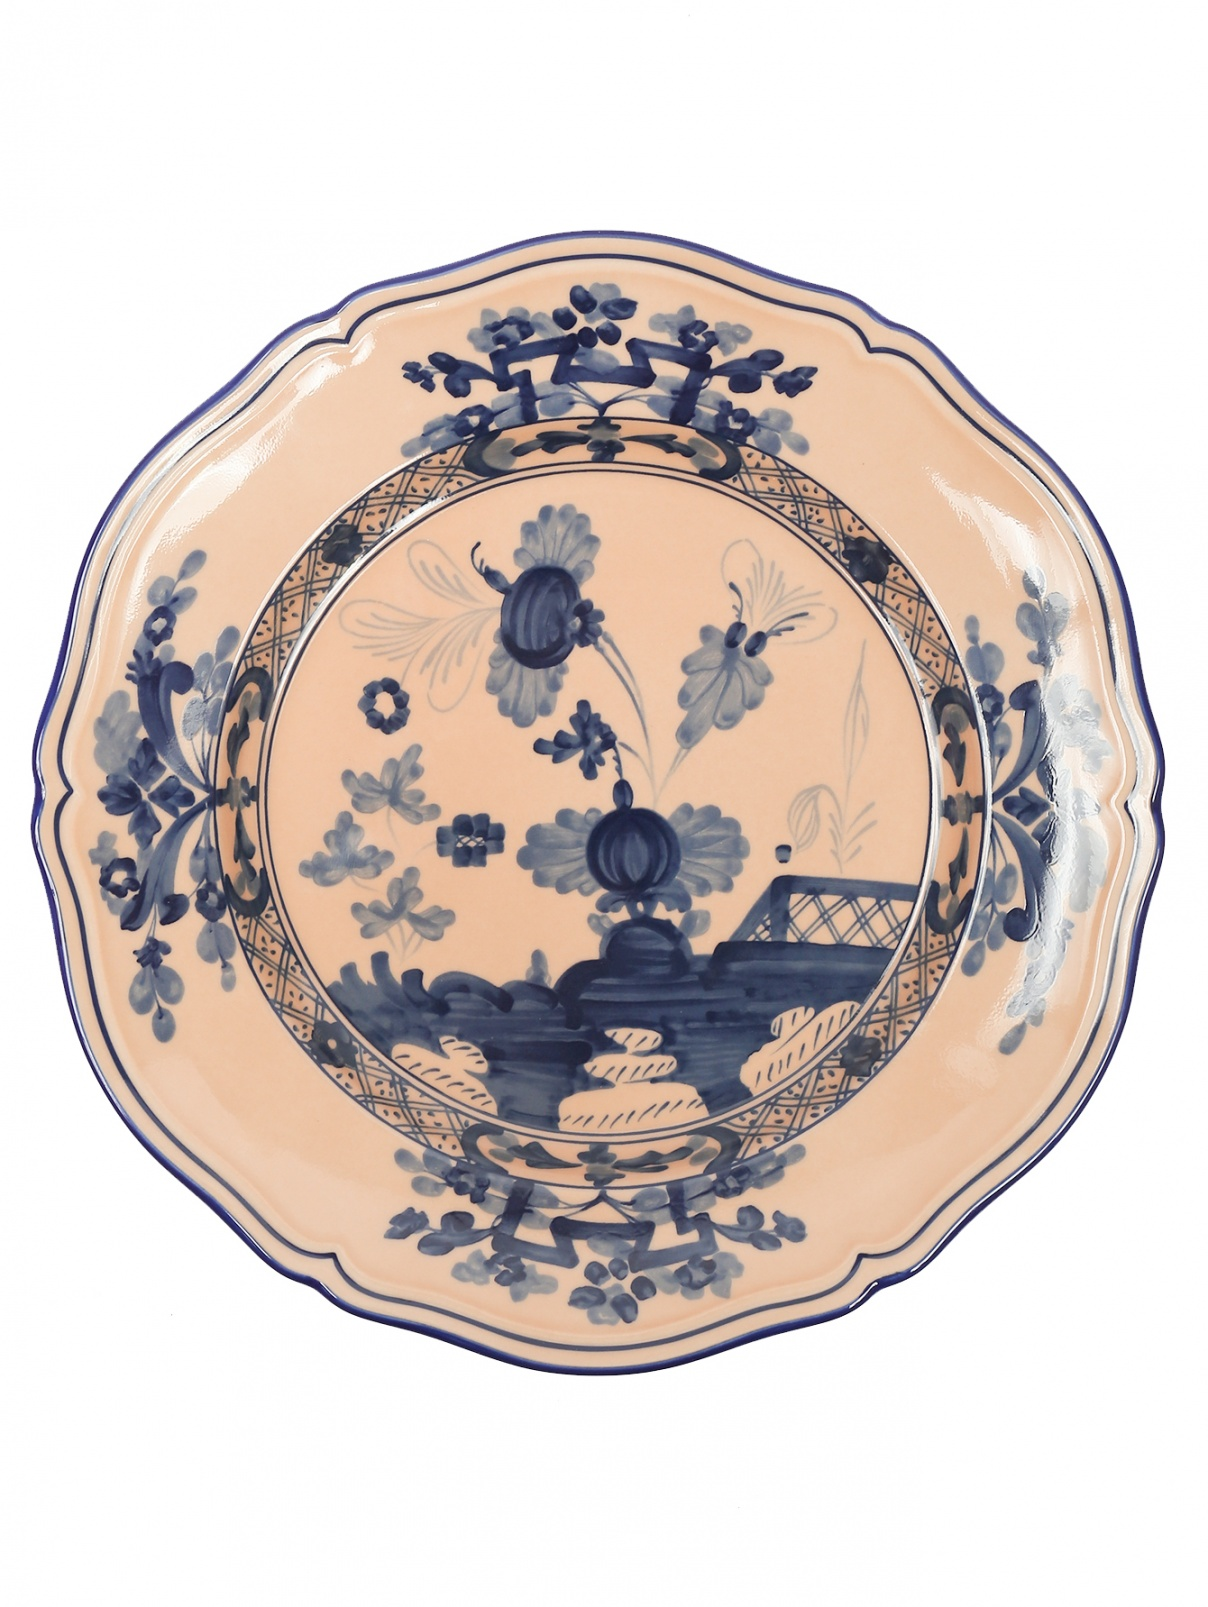 Тарелка обеденная из фарфора с узором Ginori 1735  –  Общий вид